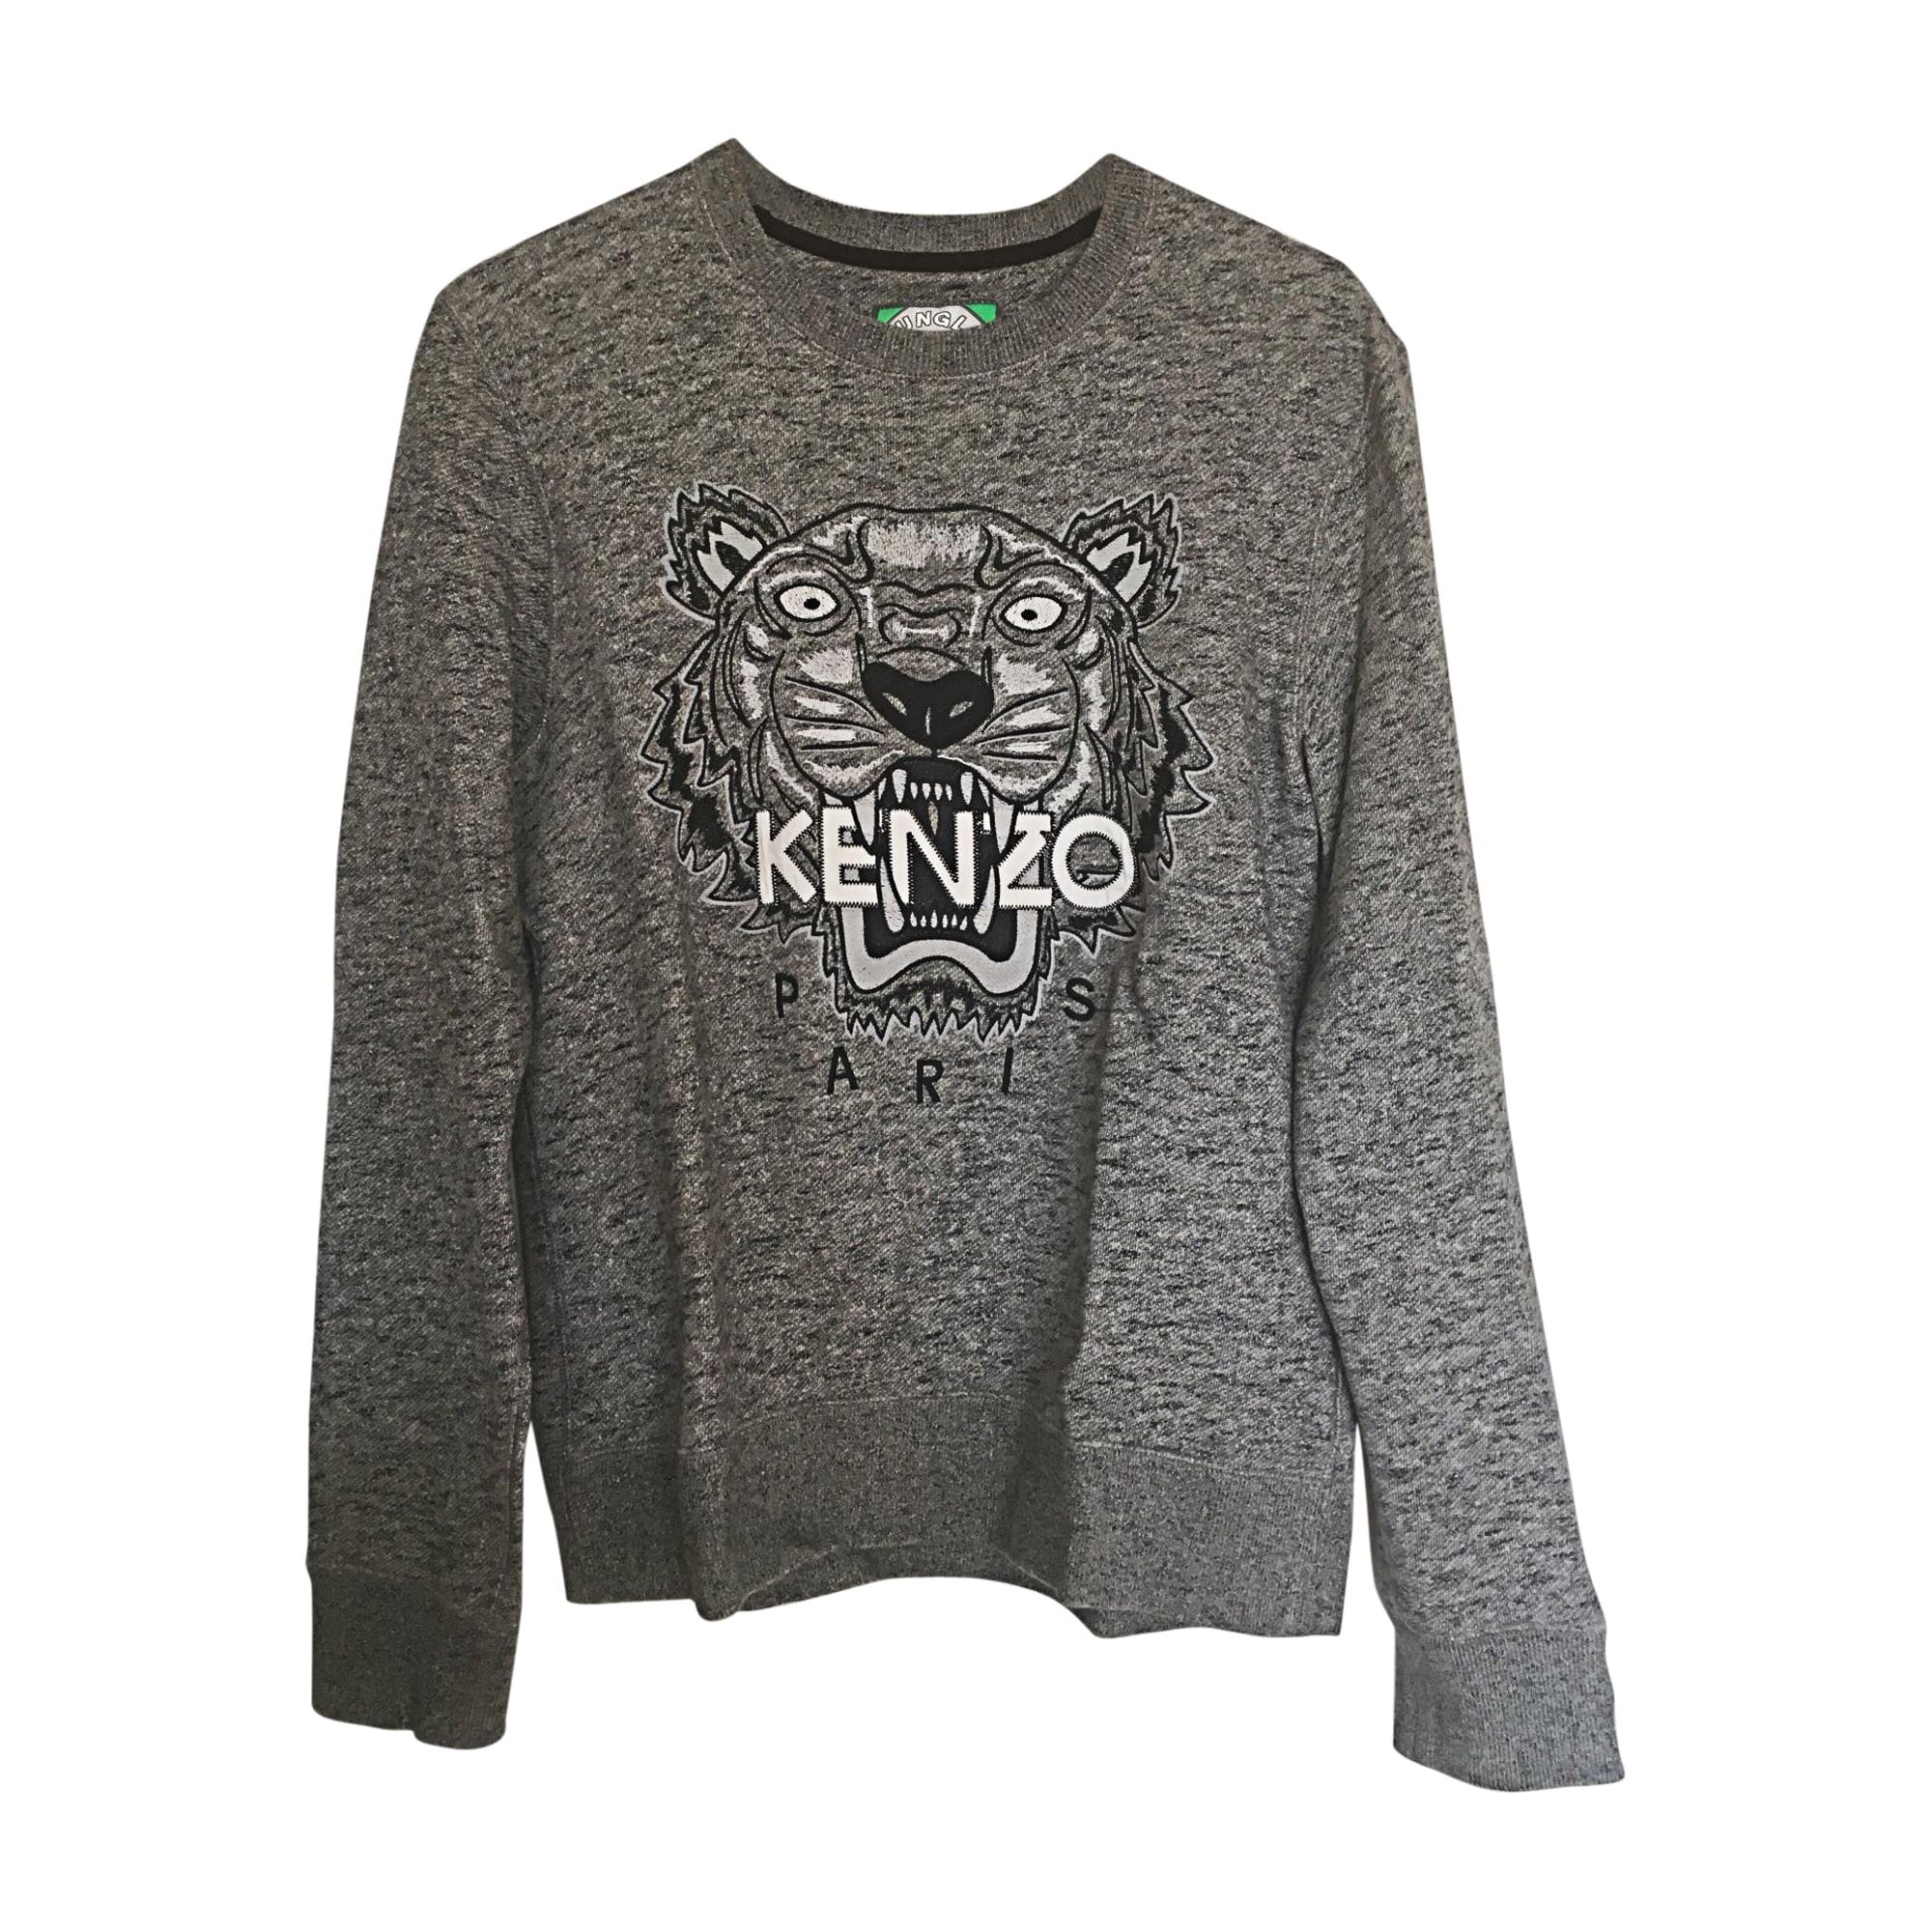 5f6d1d9f719 Sweat KENZO 1 (S) gris vendu par Vd de a - 7509703